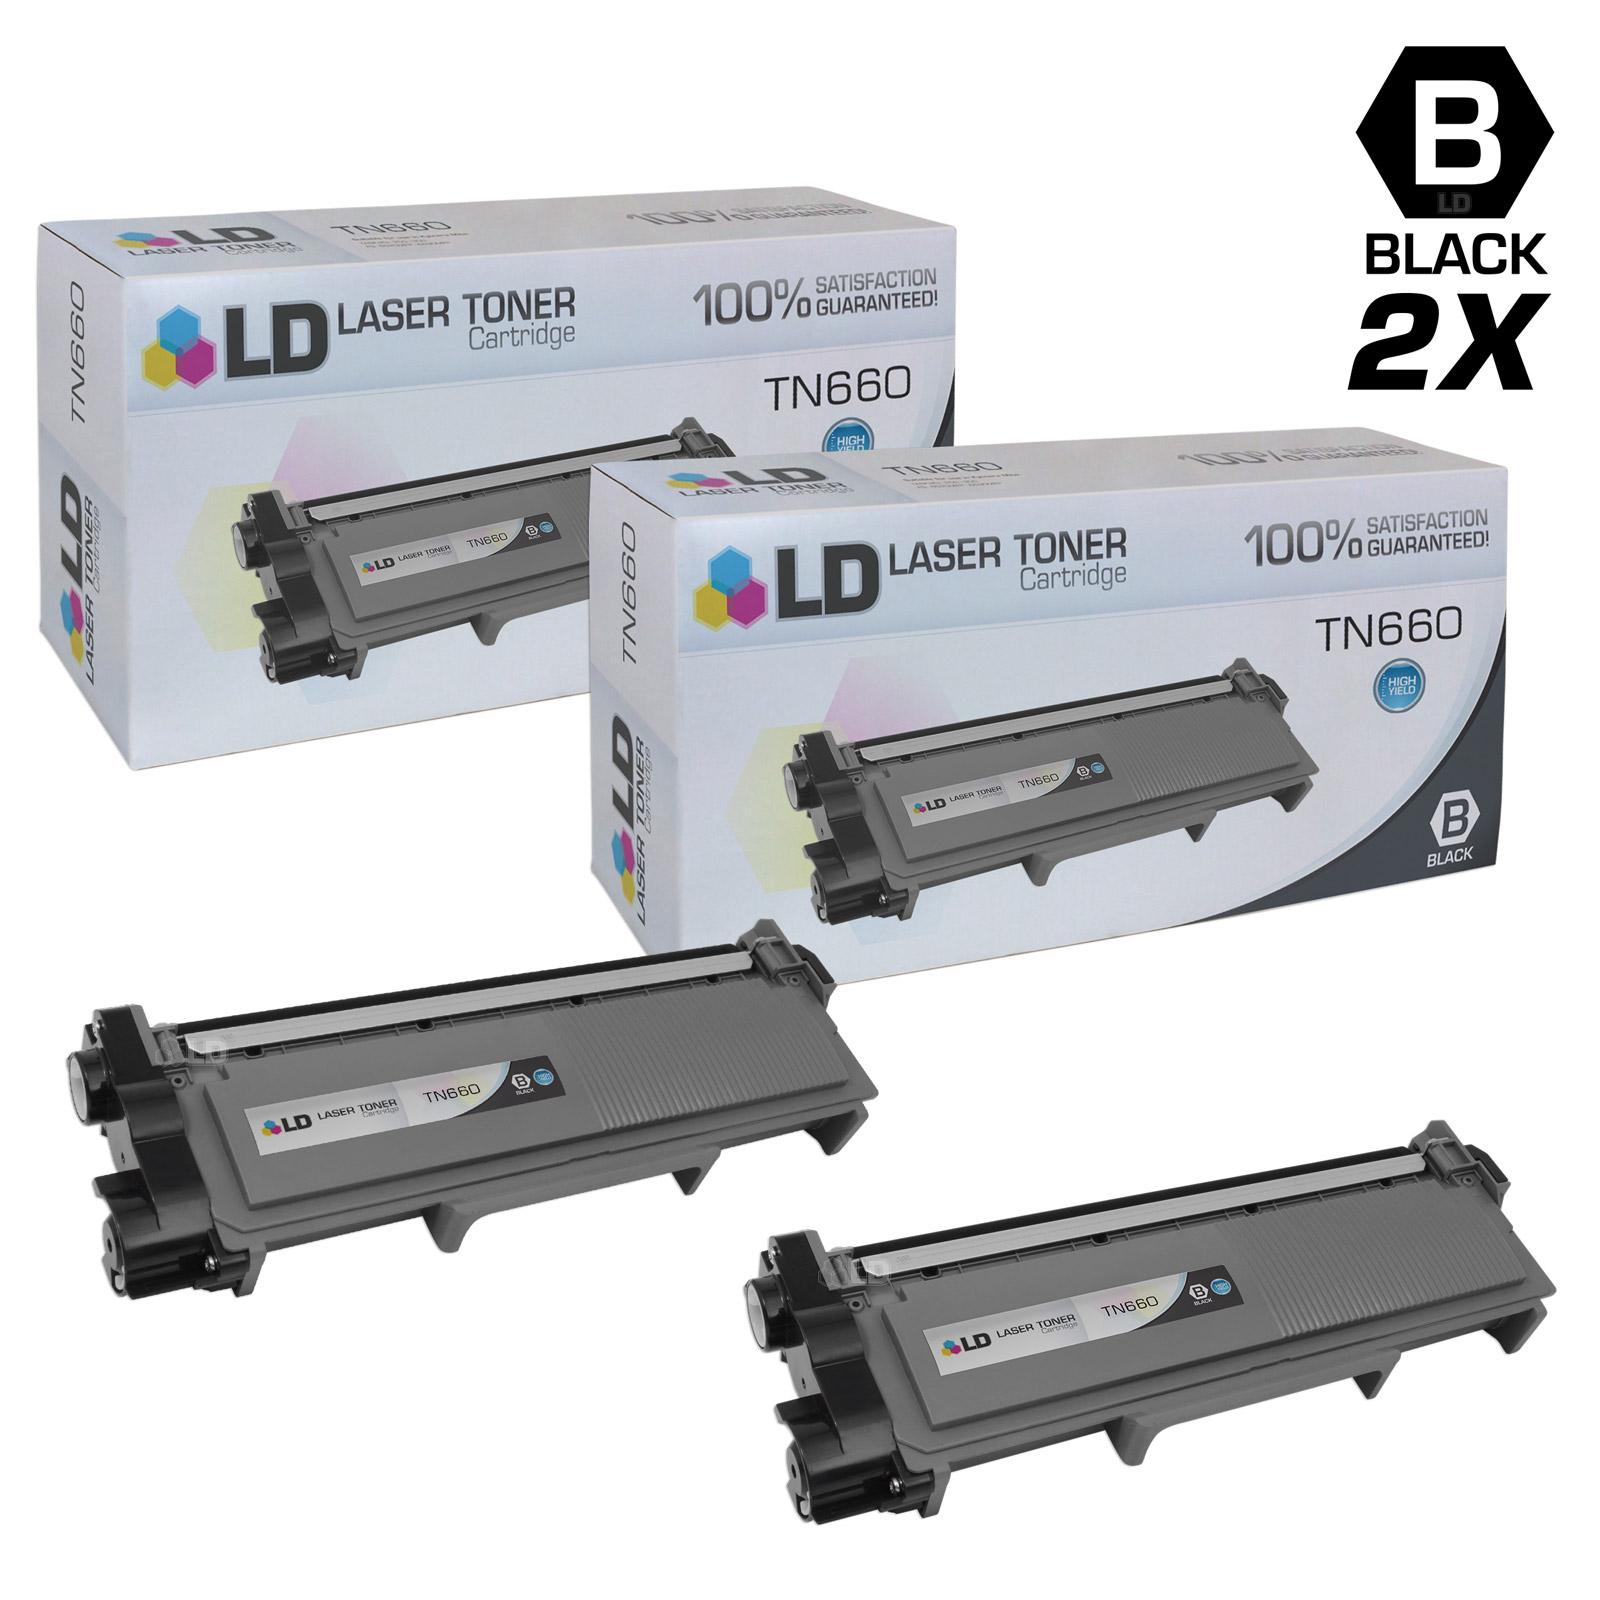 LD Compatible Brother TN660 Set of 2 HY Black Toner Cartridges for DCP-L2520DW, DCP-L2540DW, HL-L2300D, HL-L2305W, HL-L2320D, HL-L2340DW, HL-L2360DW & MFC-L2680W, MFC-L2685DW, MFC-L2740DW